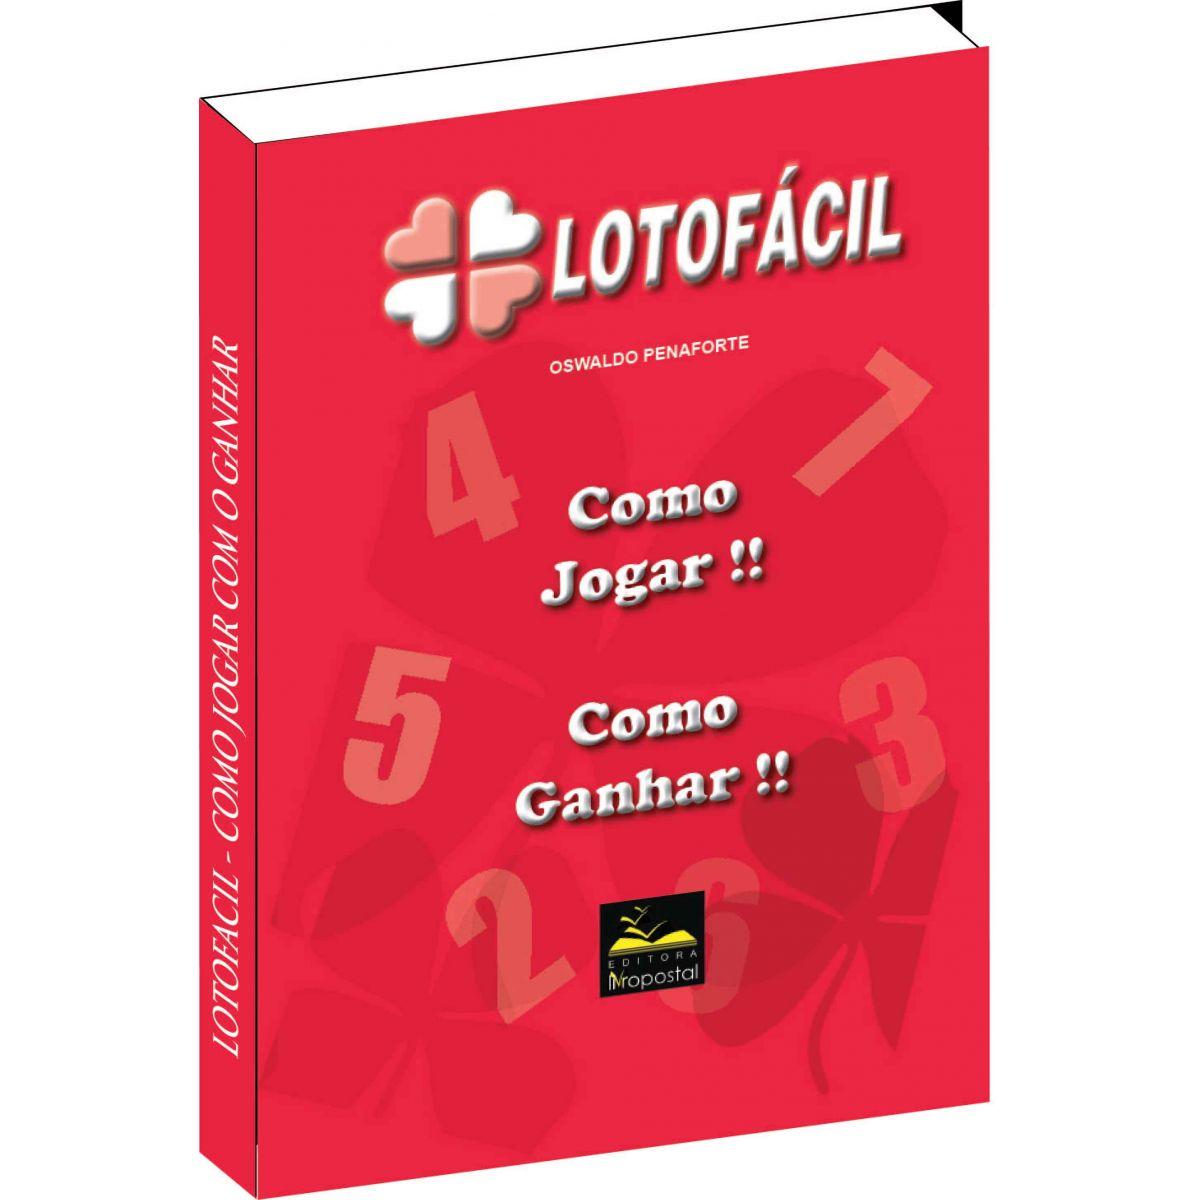 Apostila da Lotofacil  - Livropostal Editora